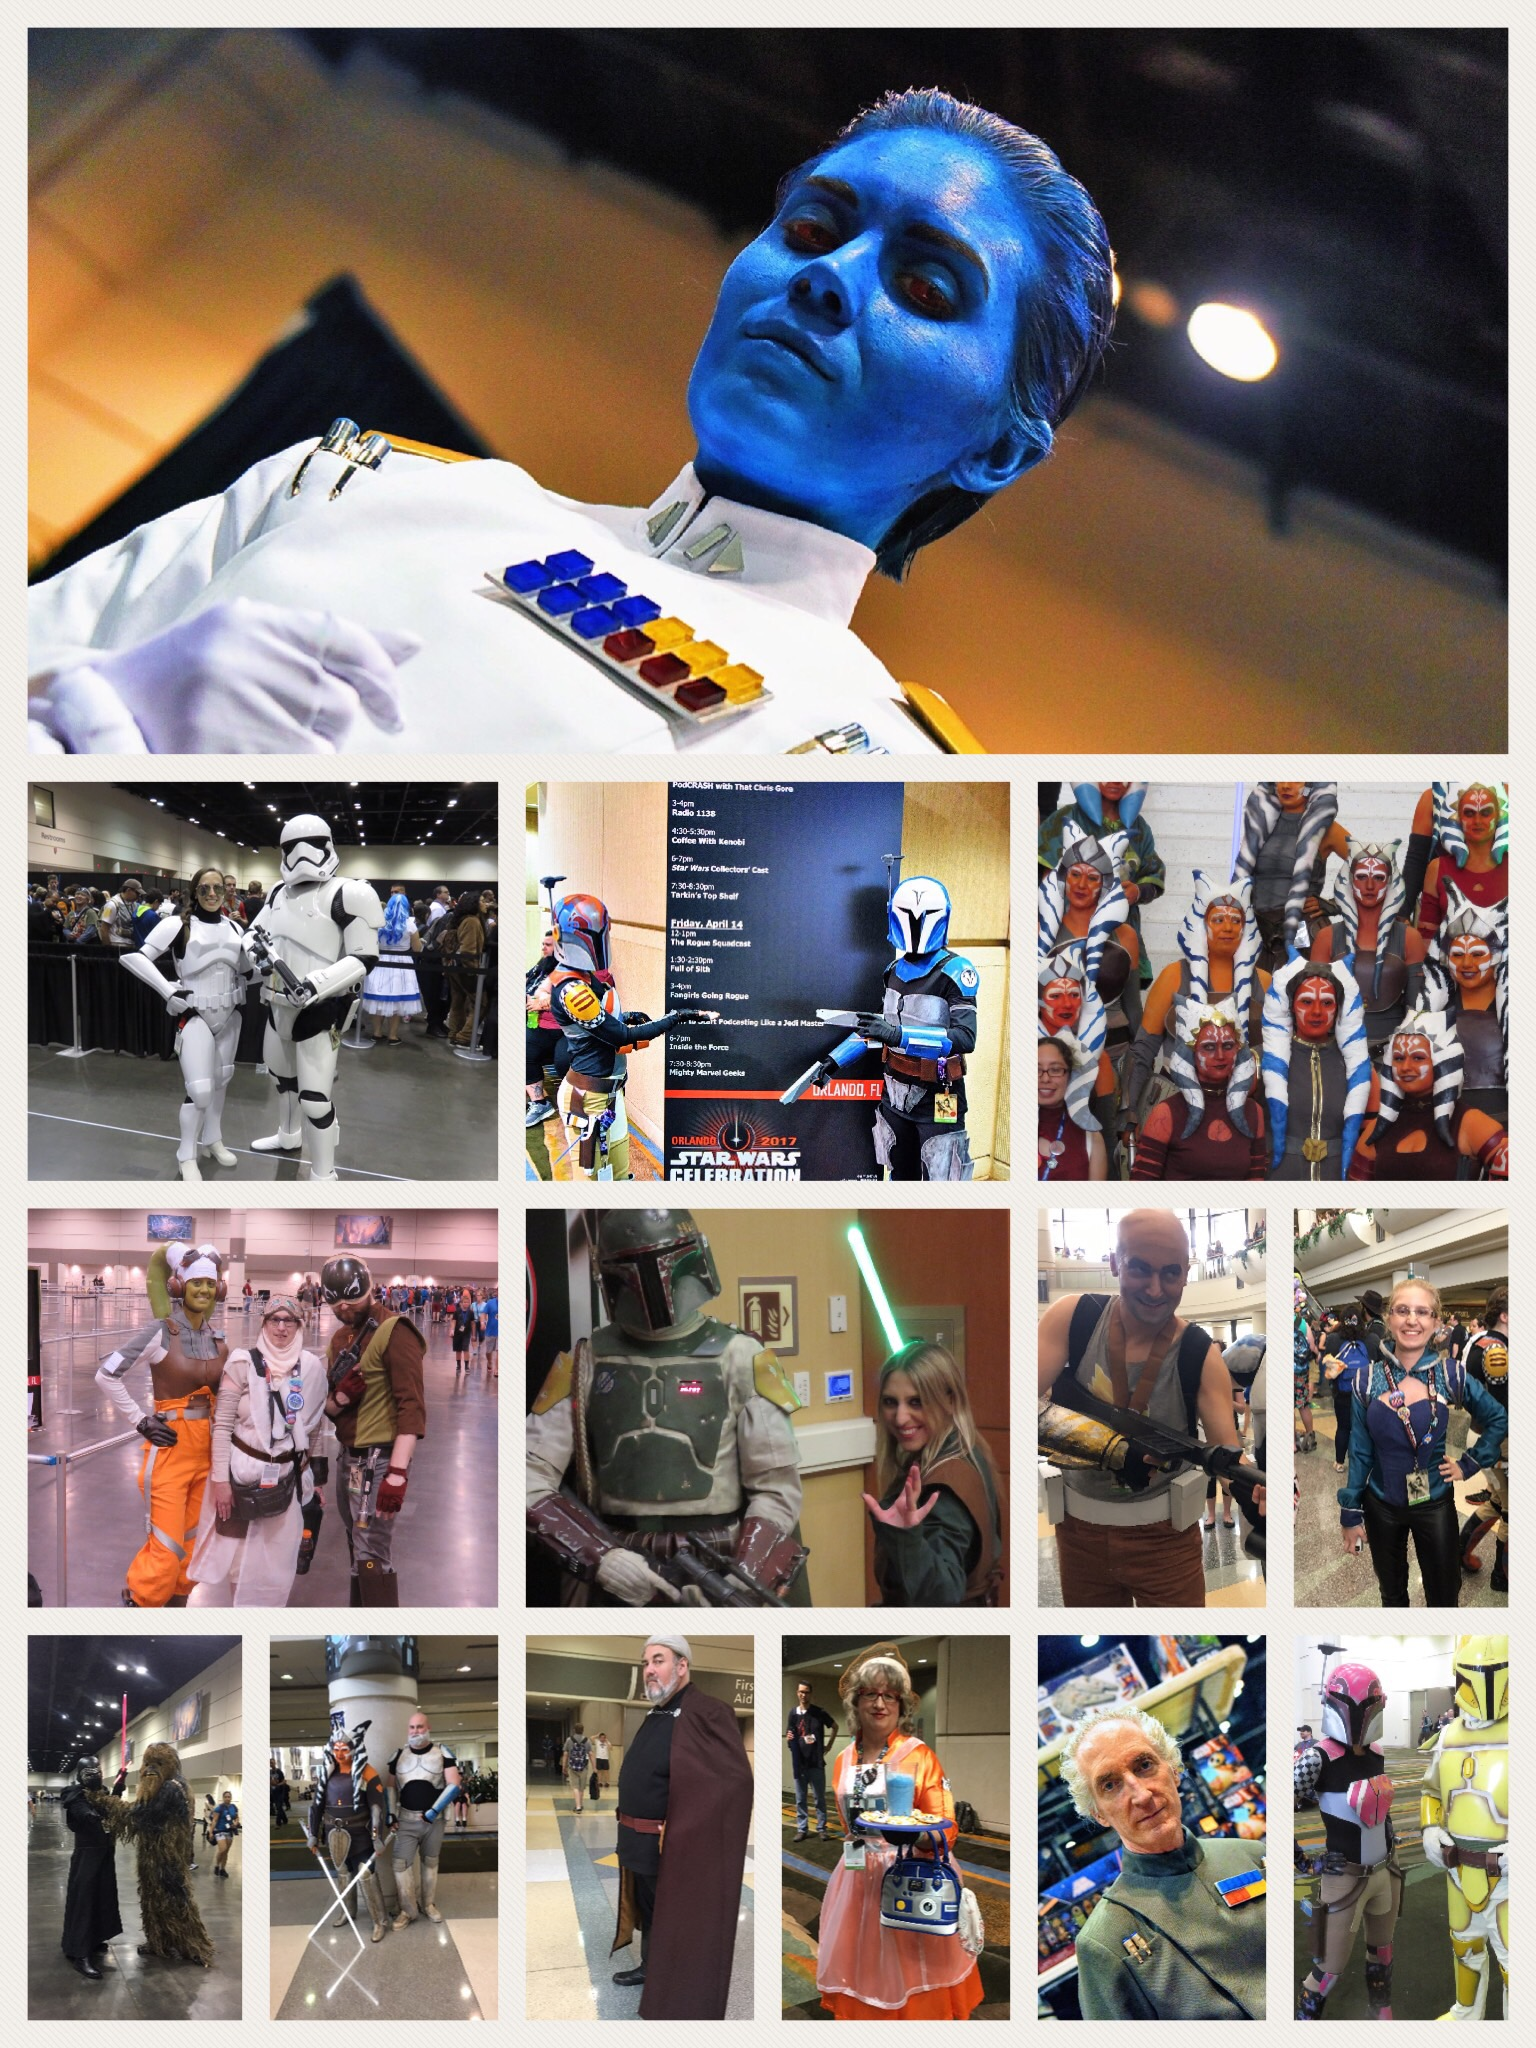 star-wars-celebration-cosplay